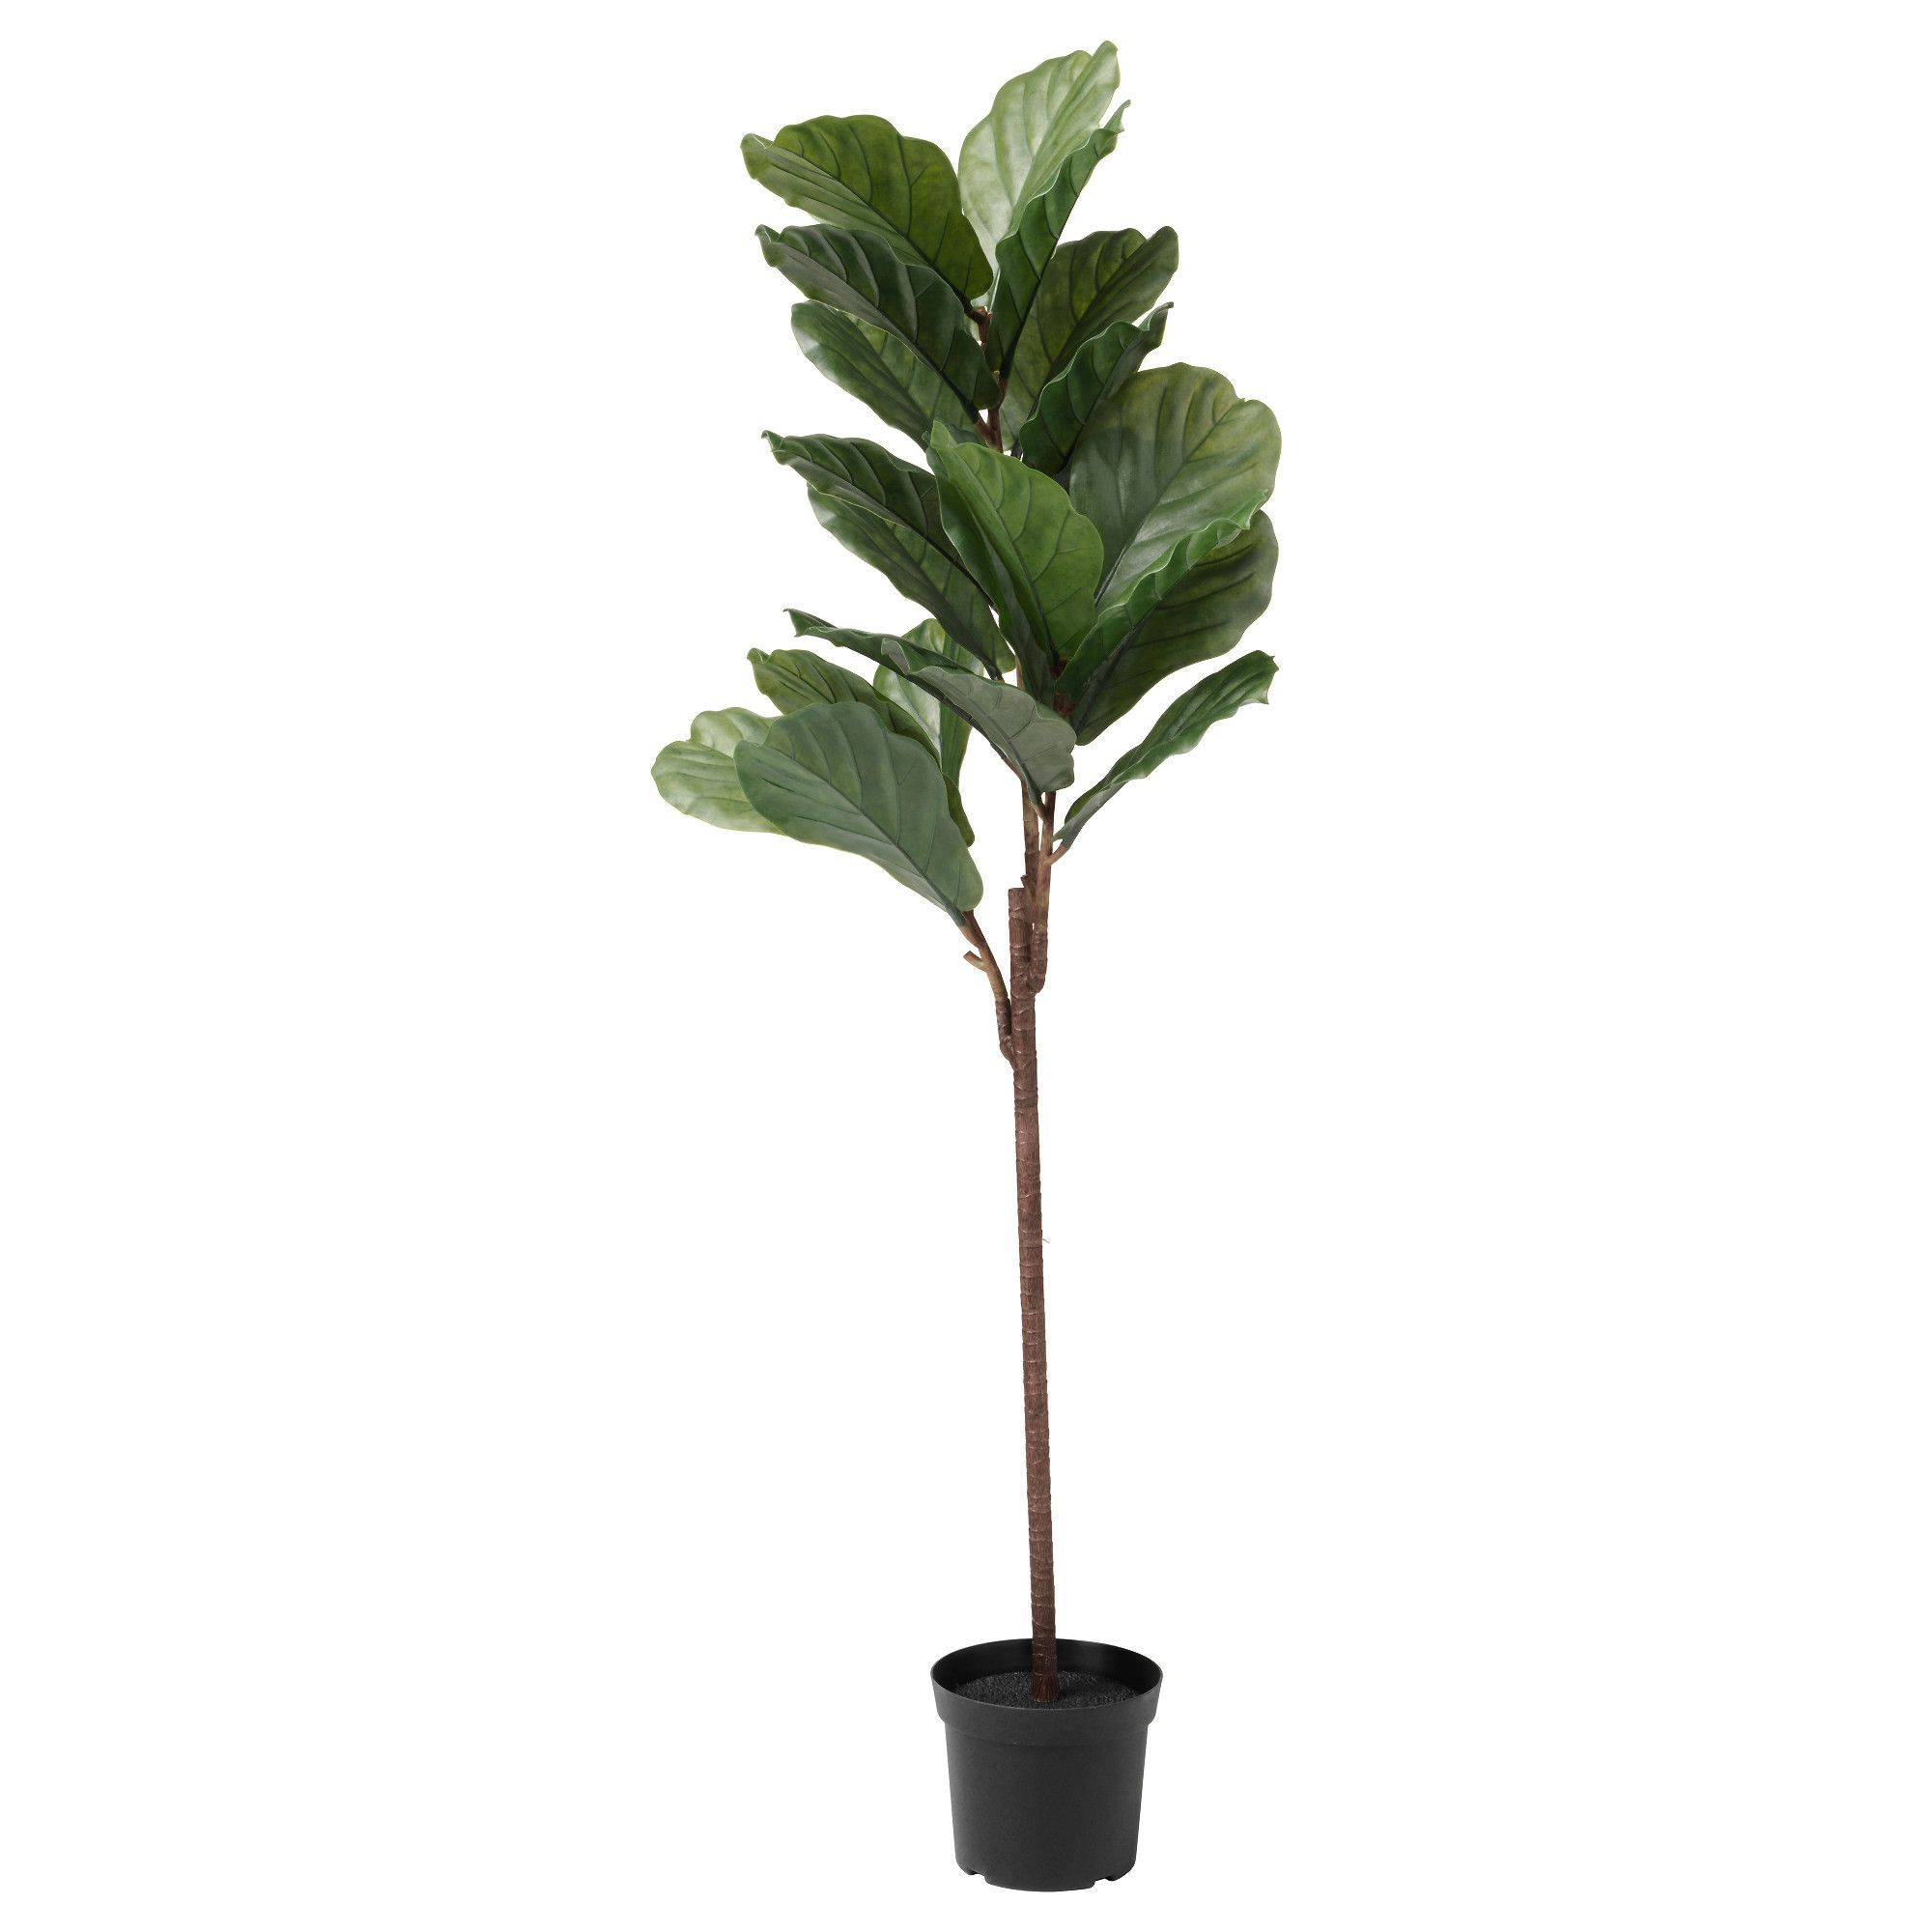 Ikea fejka artificial potted plant indooroutdoor fiddleleaf fig